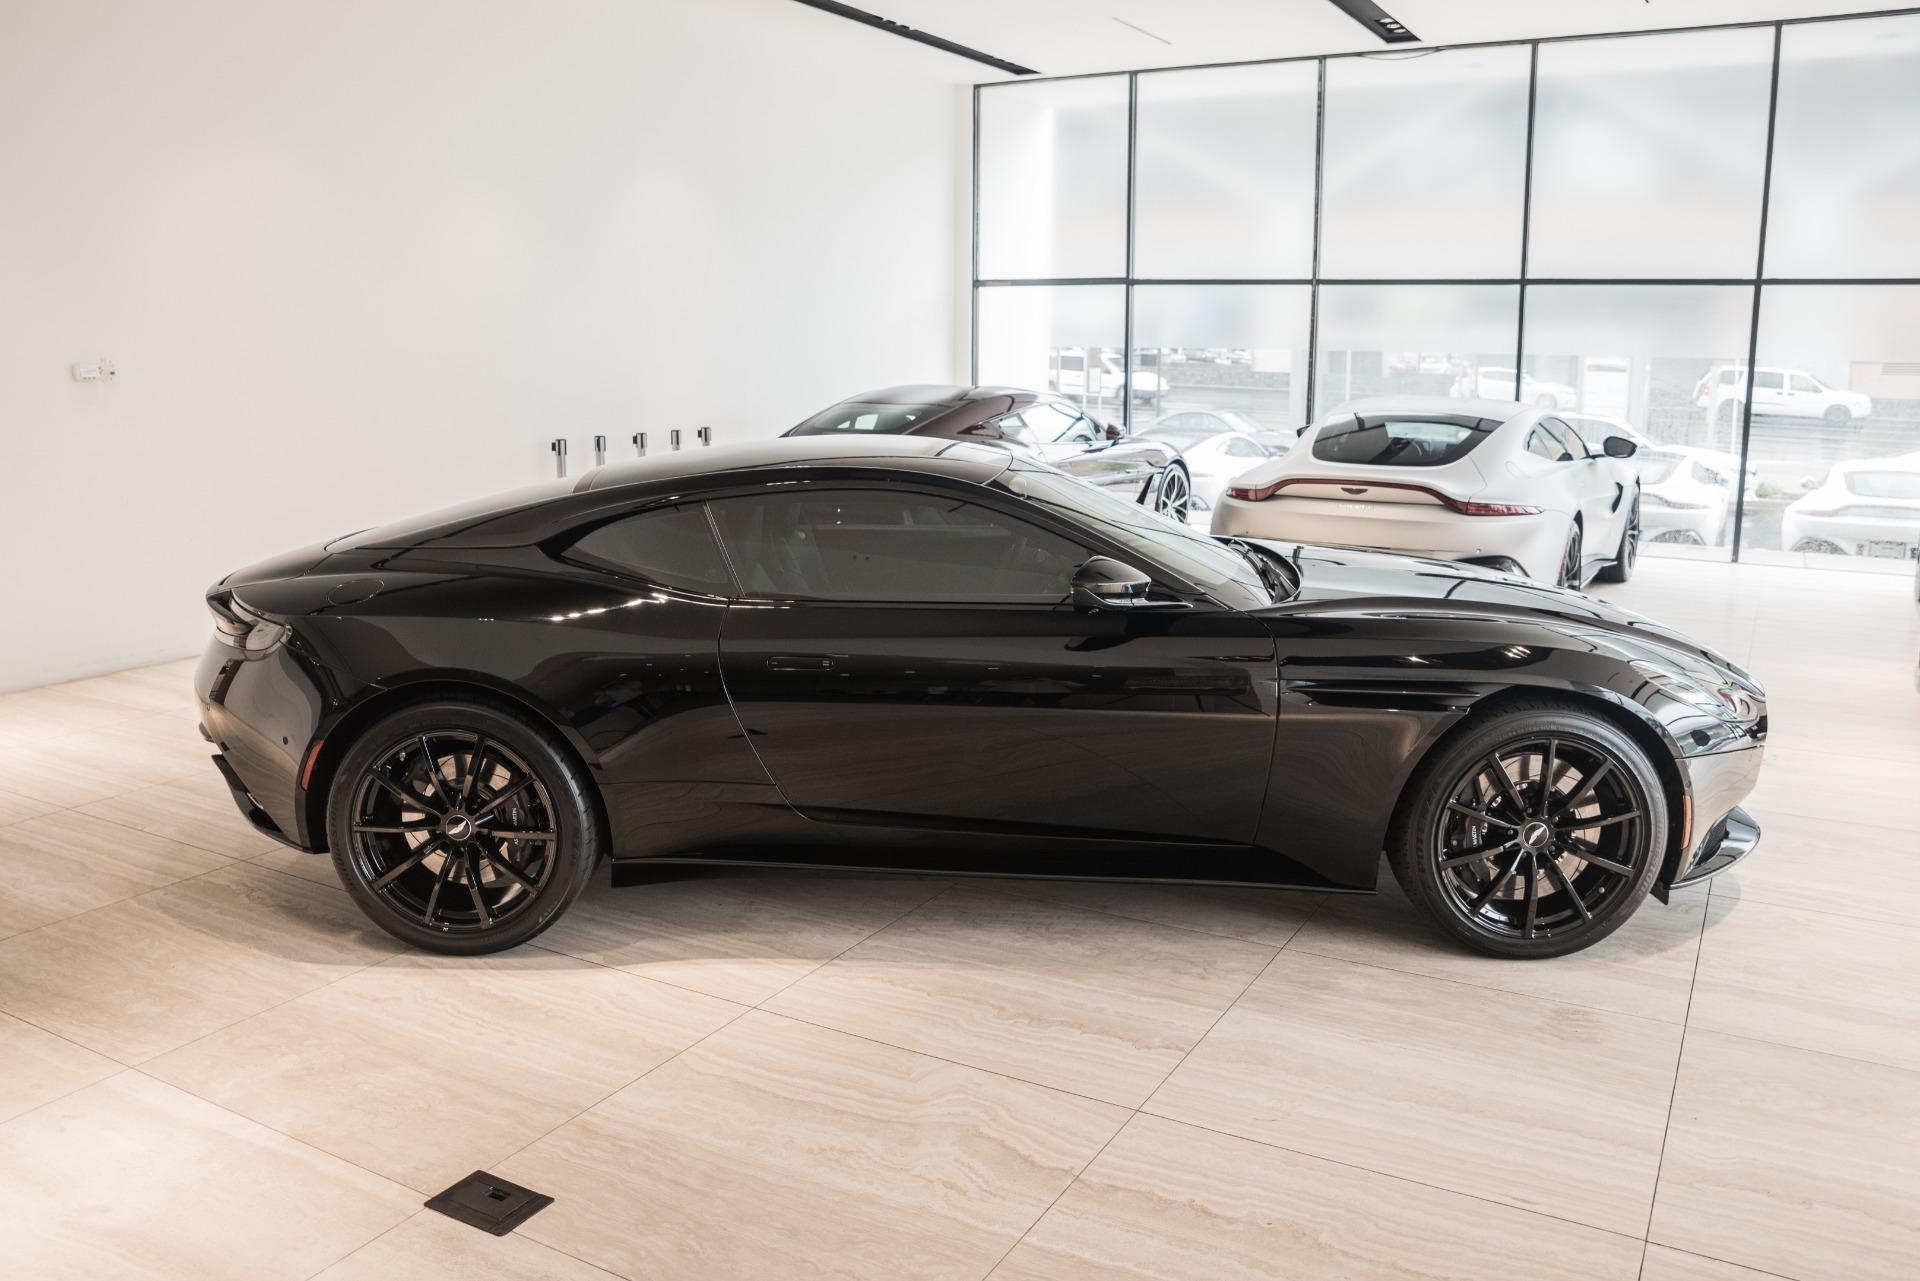 New-2019-Aston-Martin-DB11-AMR